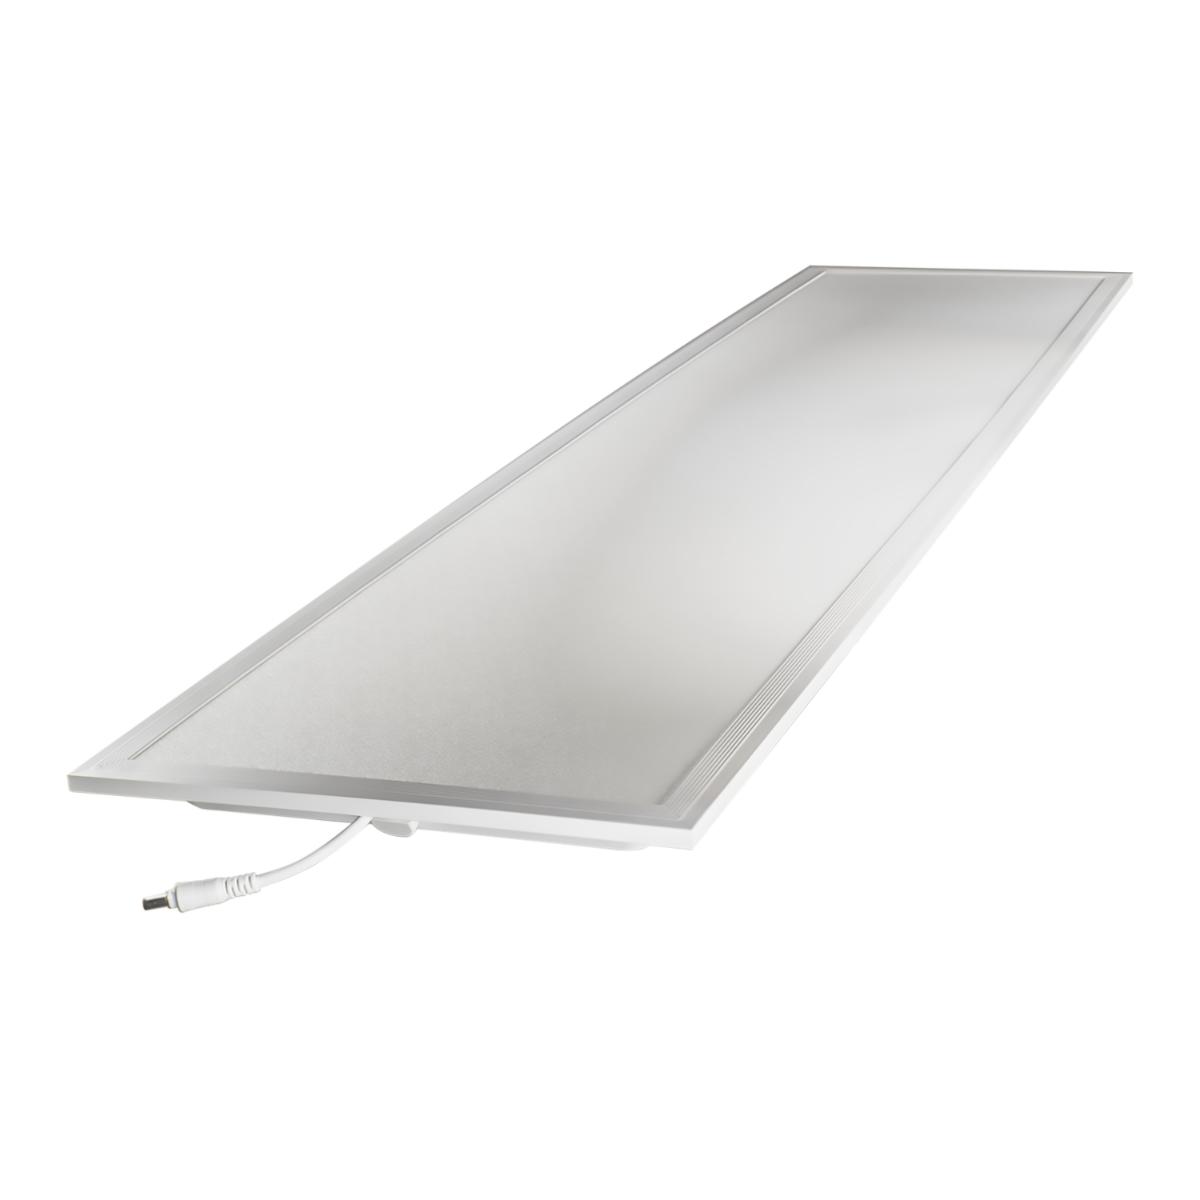 Noxion LED Panel Delta Pro Highlum V2.0 Xitanium DALI 40W 30x120cm 3000K 5280lm UGR <19 | Dali Dimbar - Varm Vit - Ersättare 2x36W